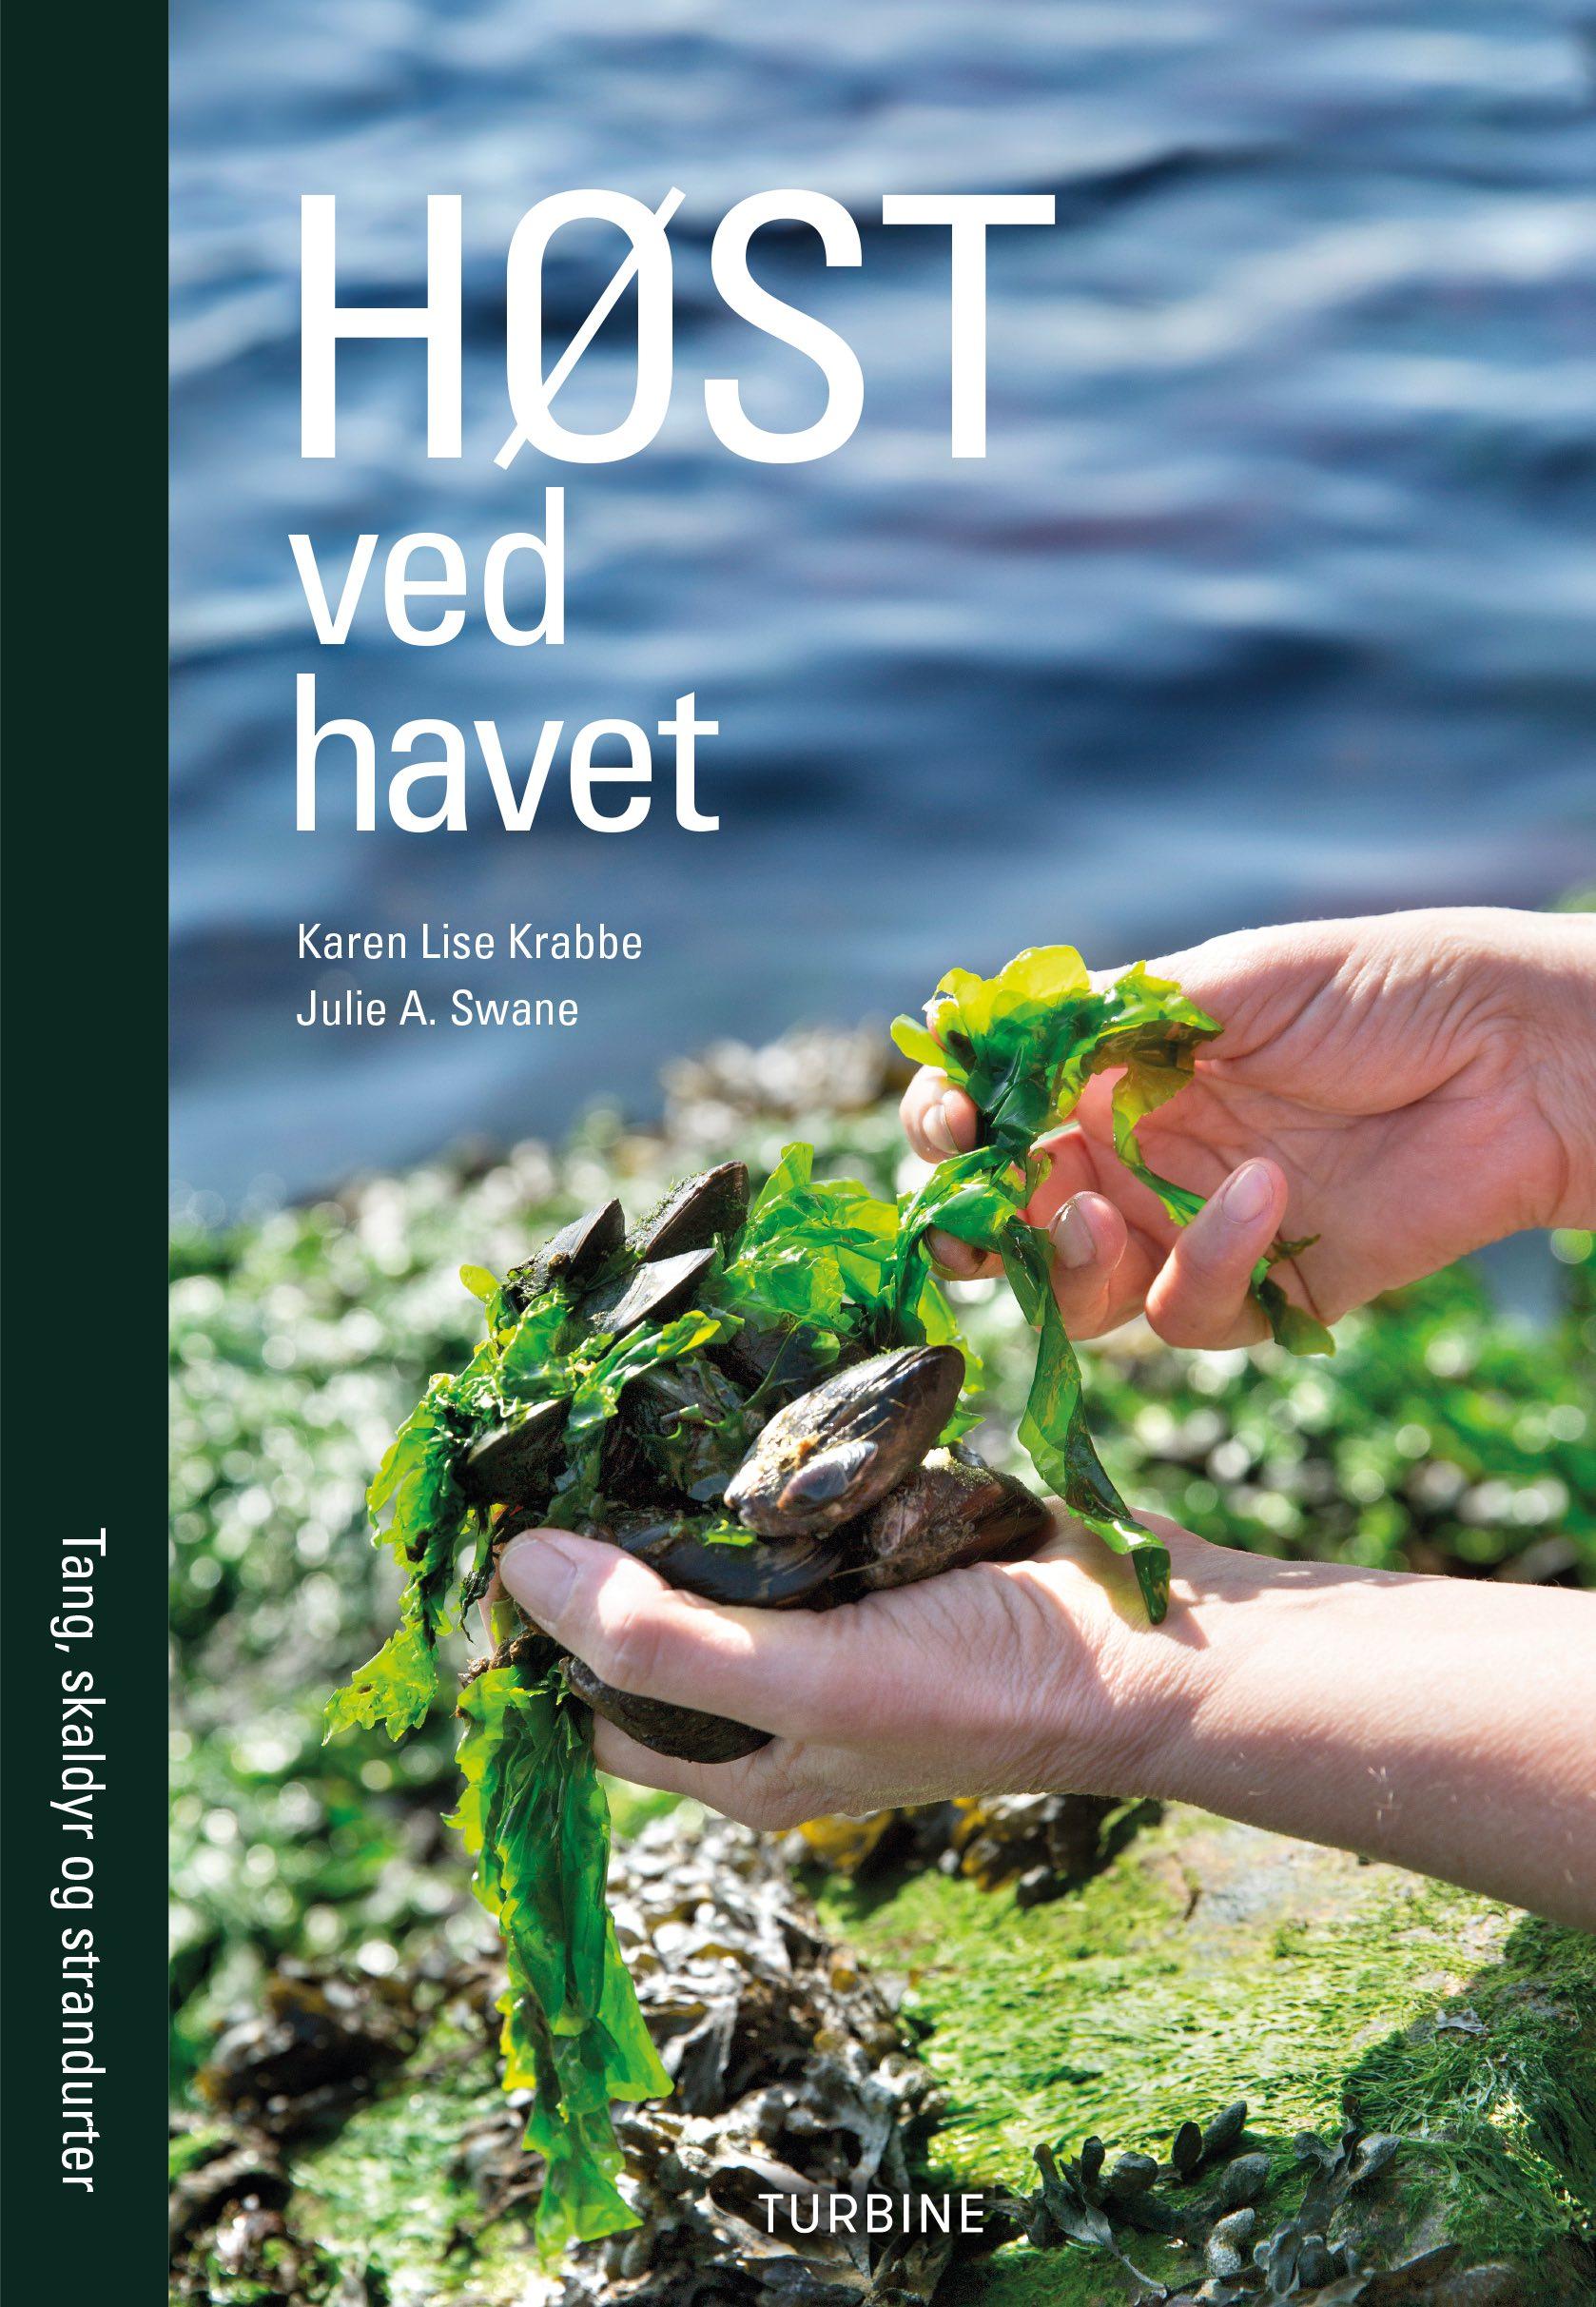 Høst ved havet - Karen Lise Krabbe og Julie Anette Swane - Bøger - Turbine - 9788740656794 - 18. september 2019